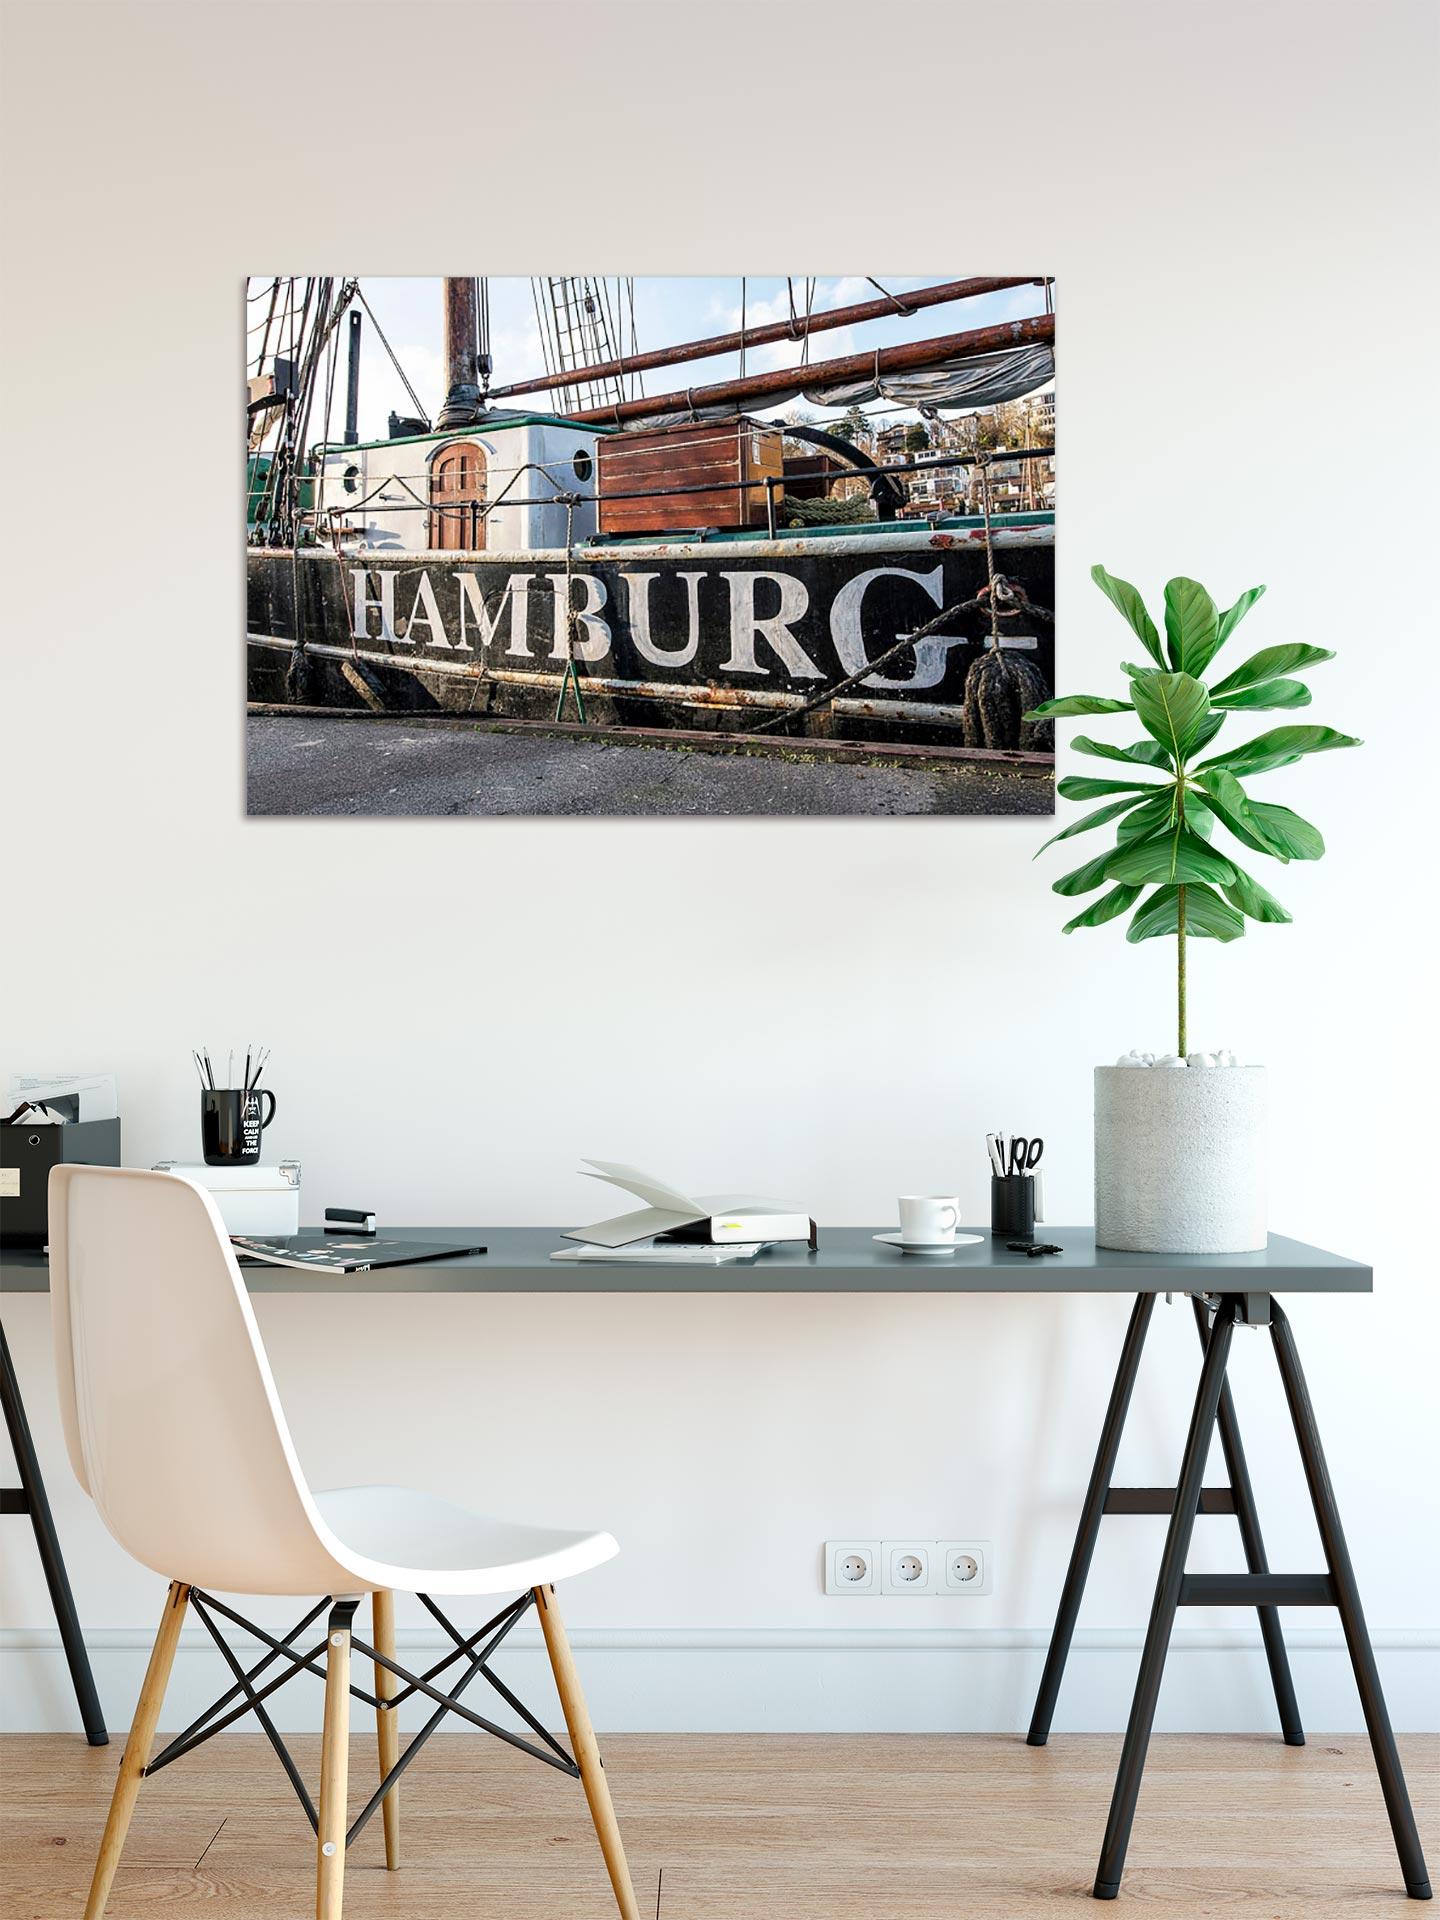 NL057-schiffswand-hamburg-wandbild-auf-leinwand-acrylglas-aludibond-arbeitszimmer